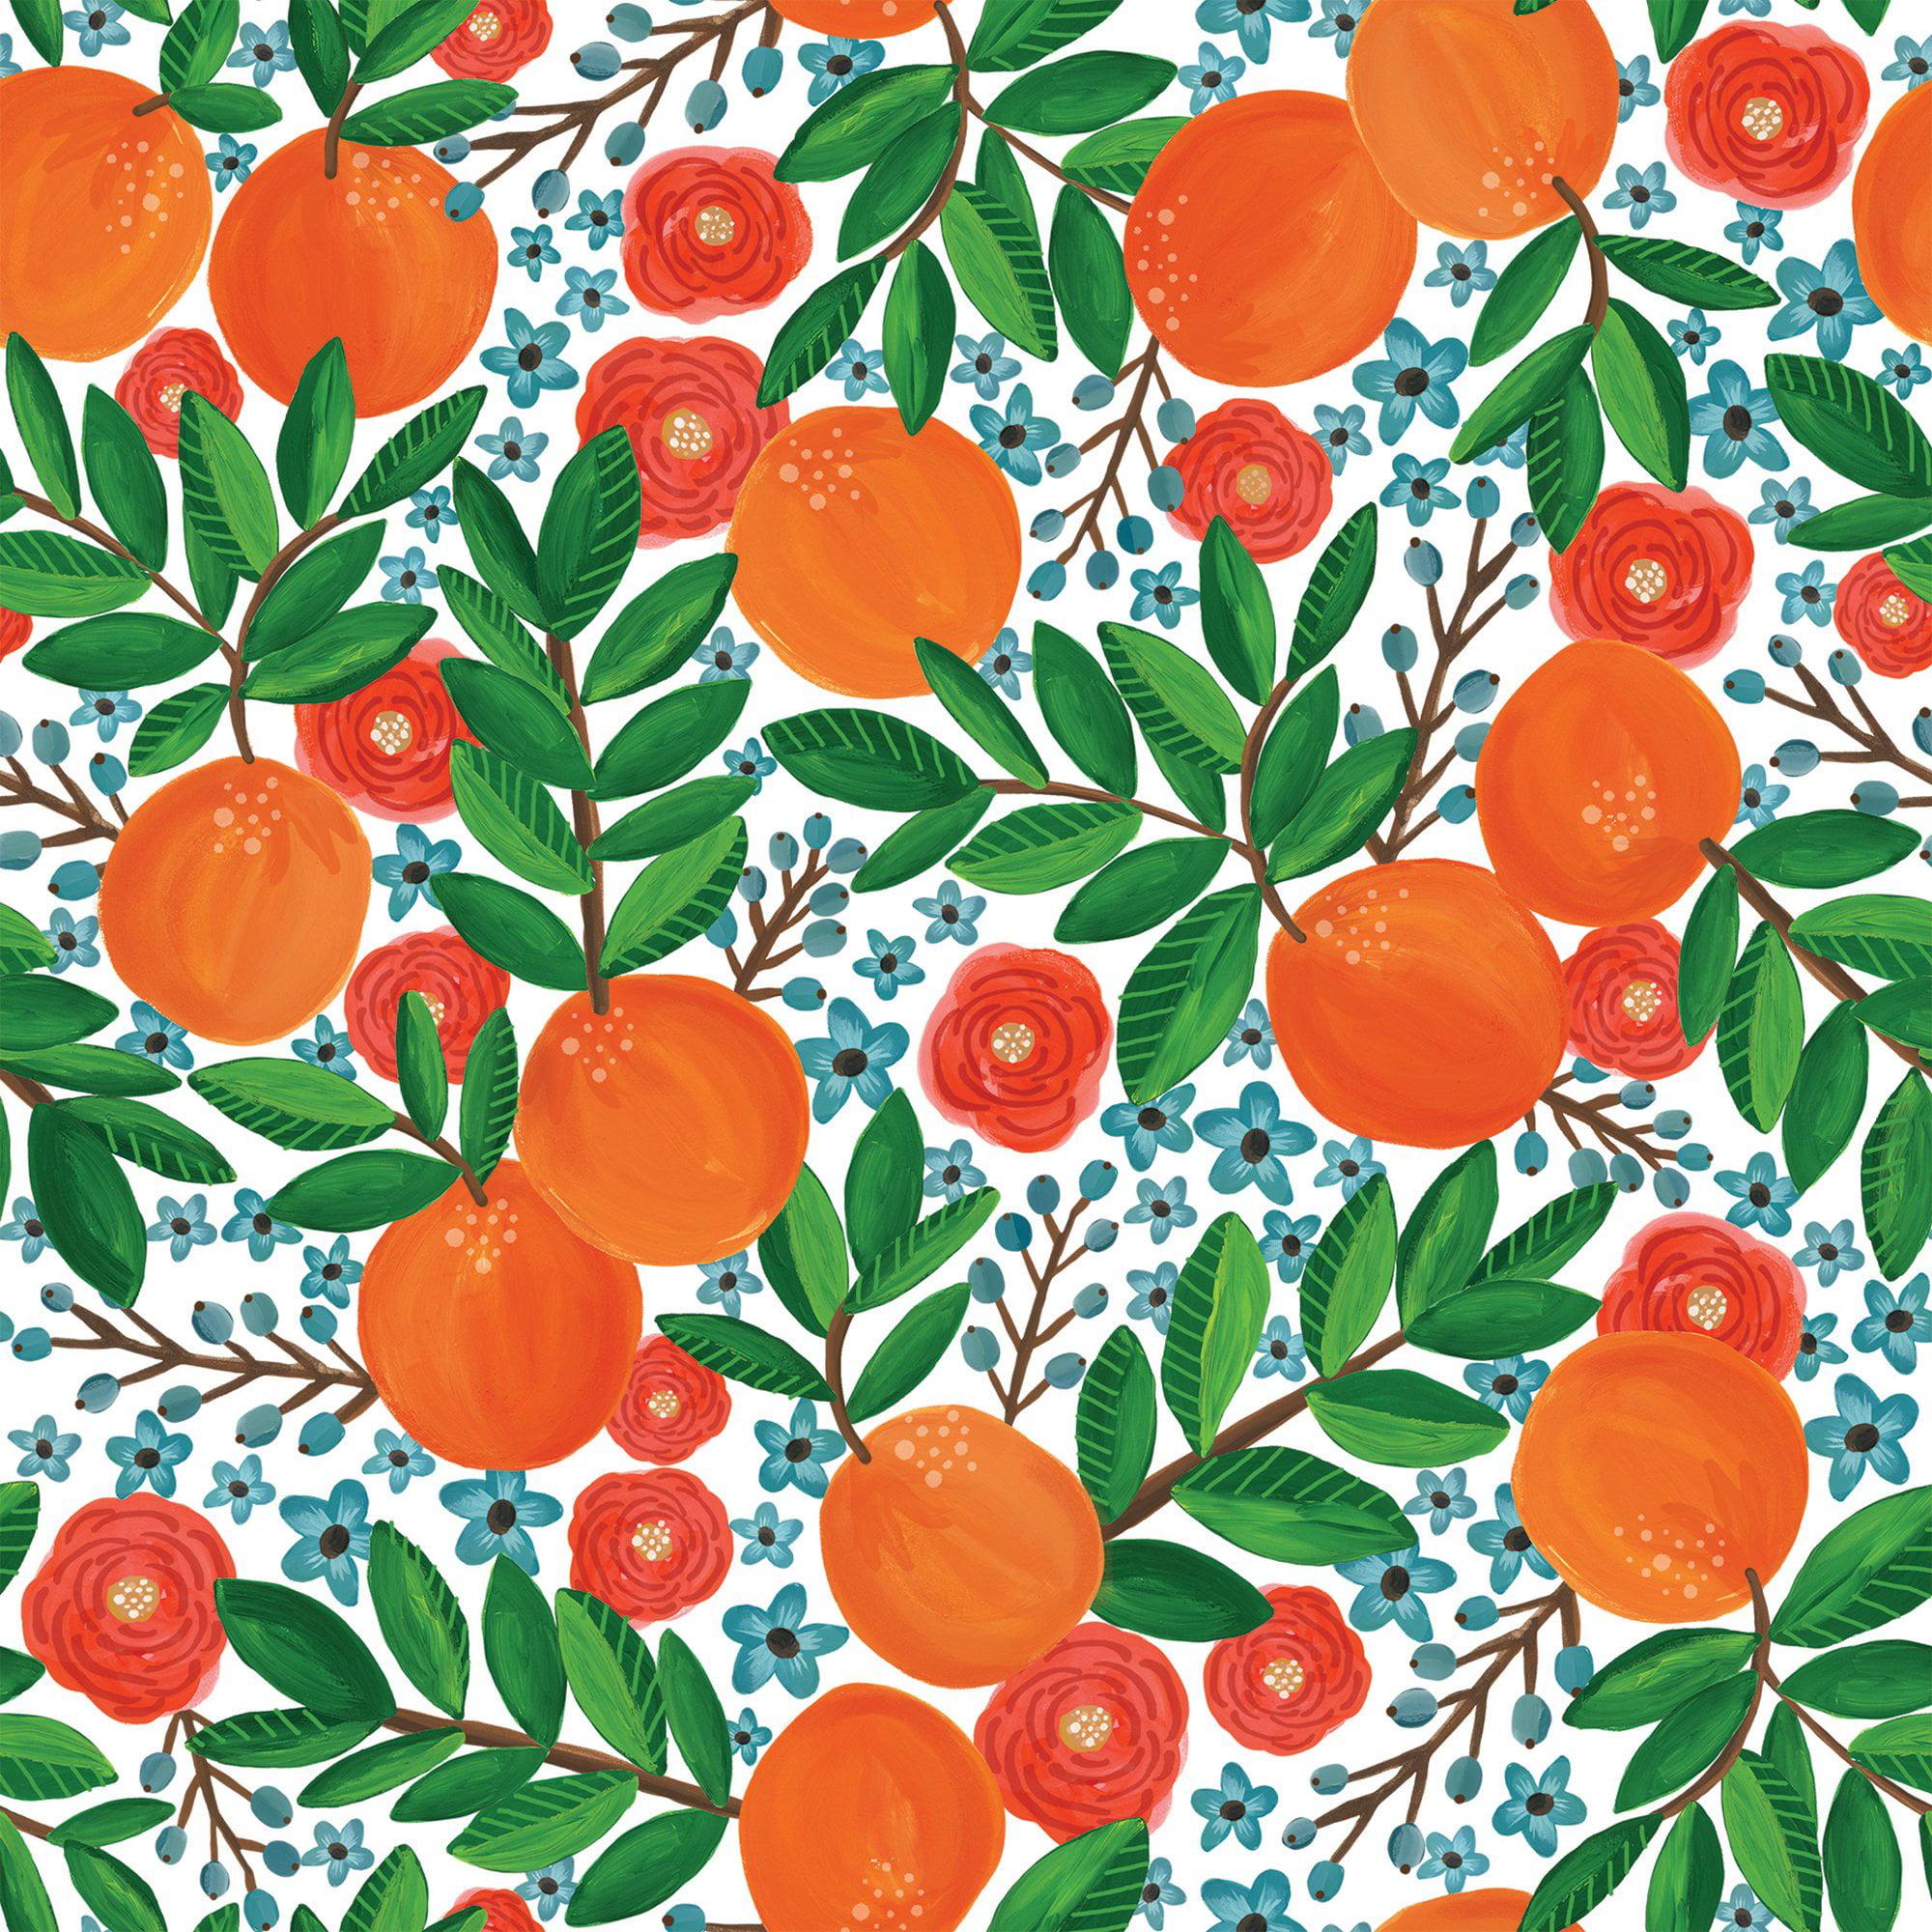 "Jillson & Roberts Bulk Gift Wrap, Mandarin Grove, 1/4 Ream 208' x 24"""